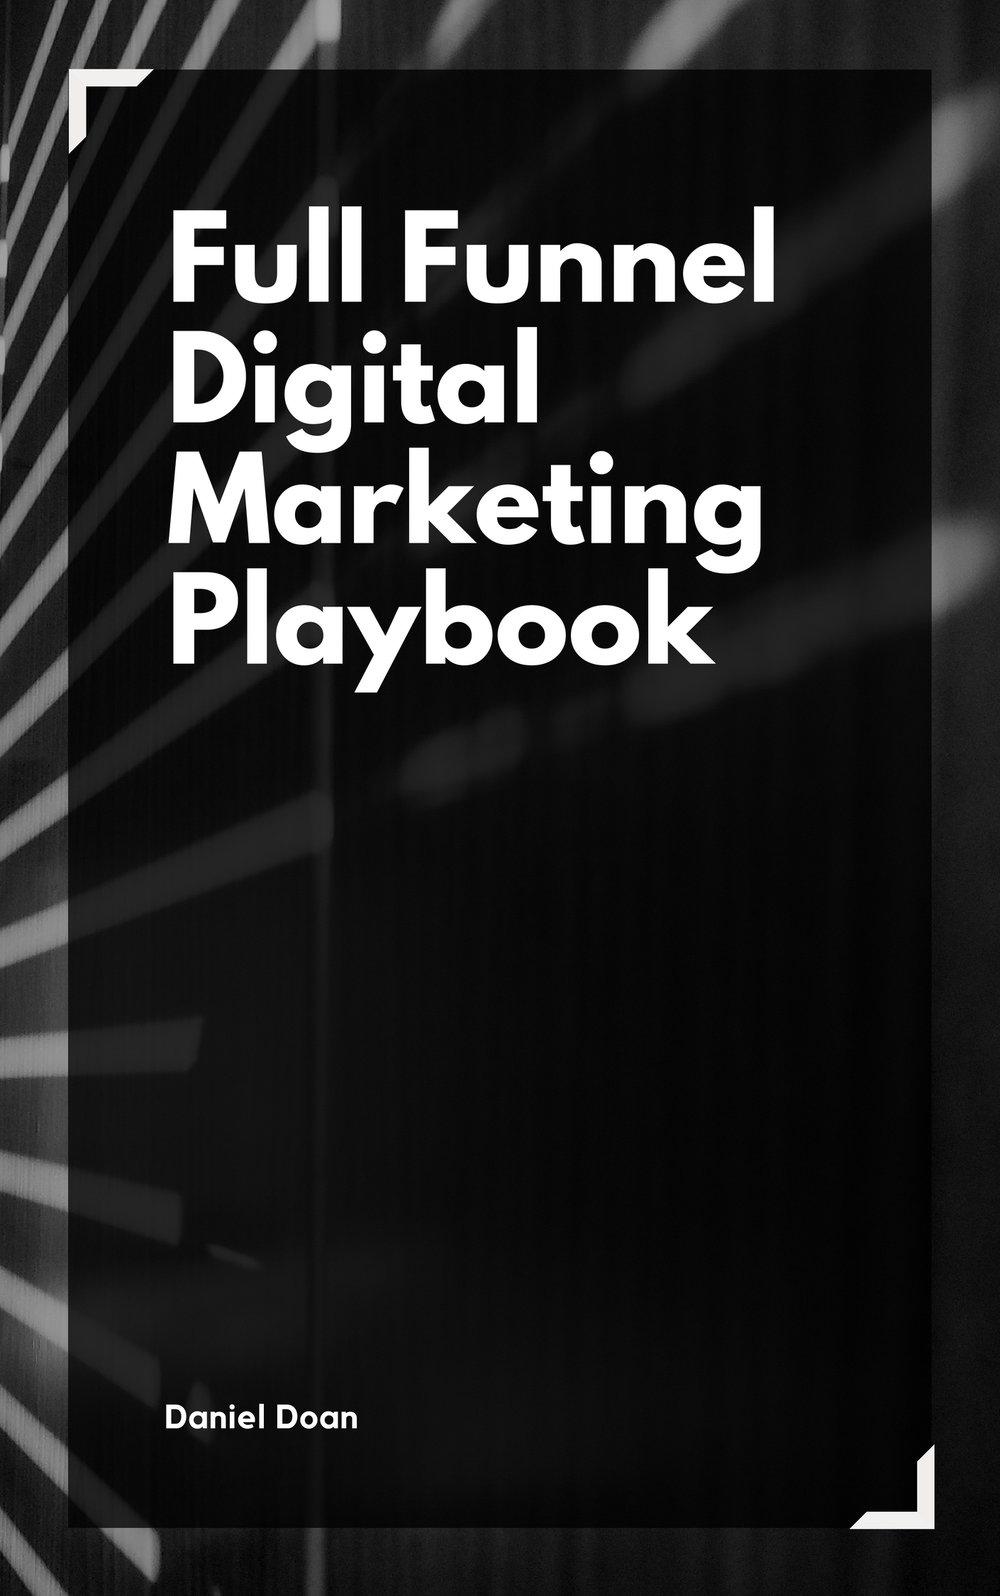 Full Funnel Growth Marketing Playbook.jpg